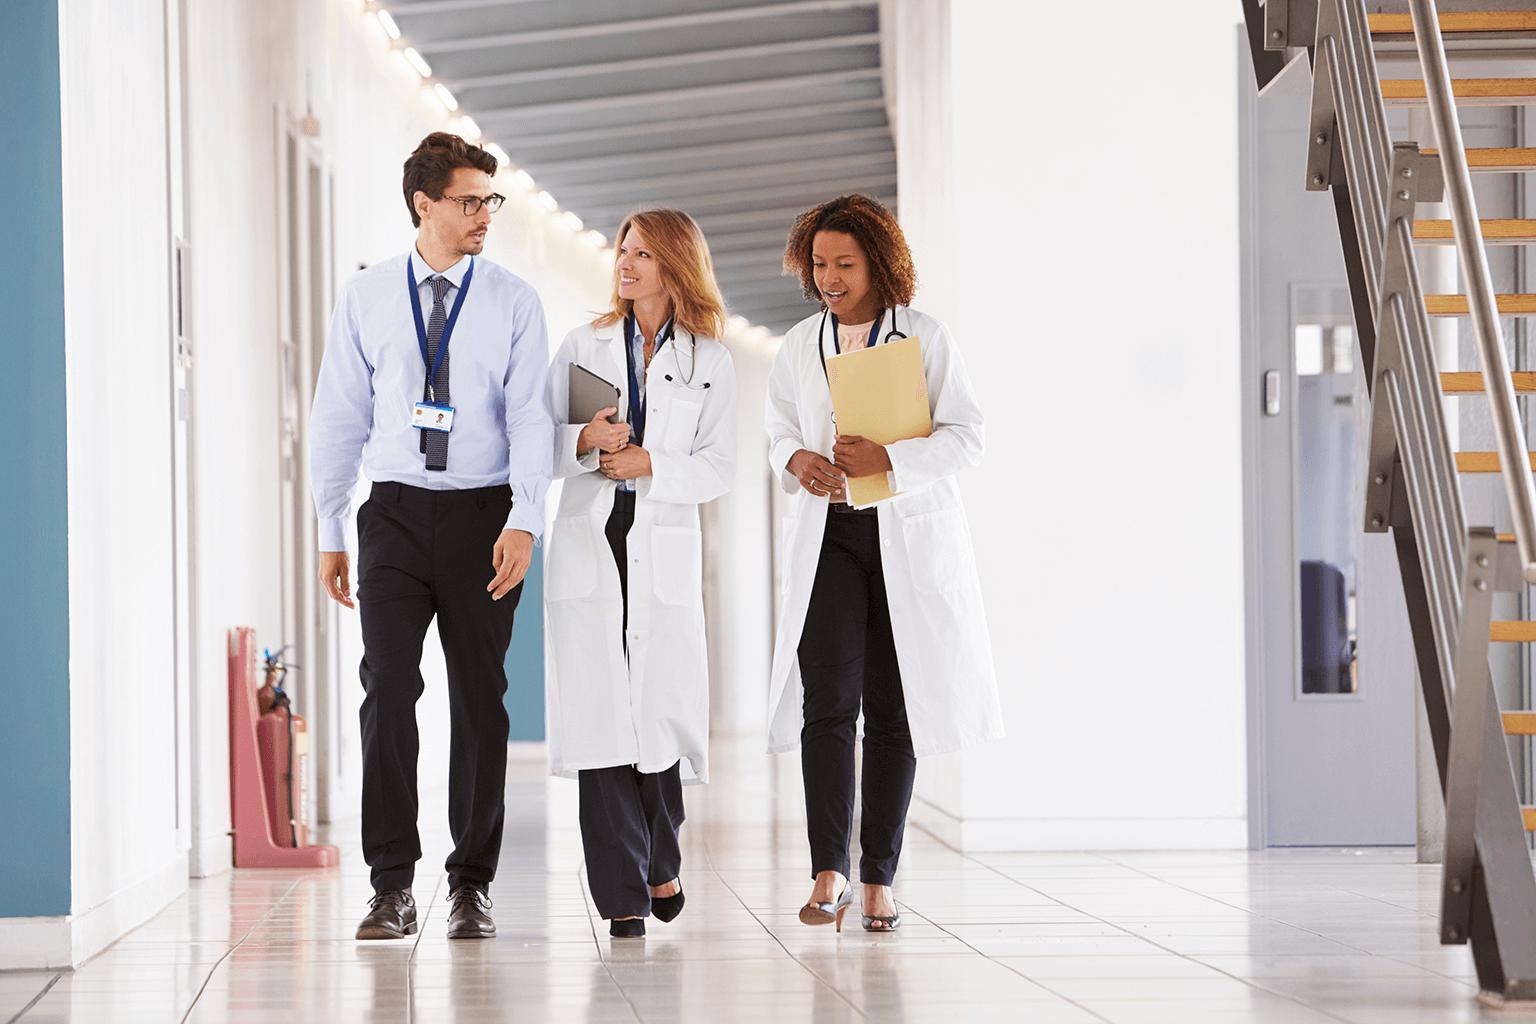 clinicians-walking-down-hallway-in-hospital